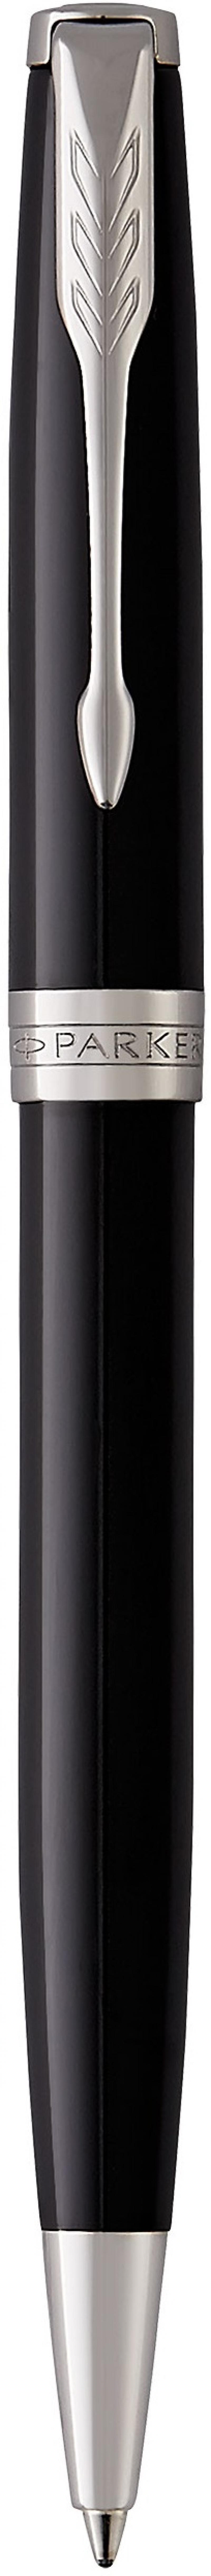 Шариковая ручка поворотная Parker Sonnet Core K530 LaqBlack CT черный M 1931502 ручка шариковая parker sonnet k530 s0808830 laqblack ct m черные чернила подар кор